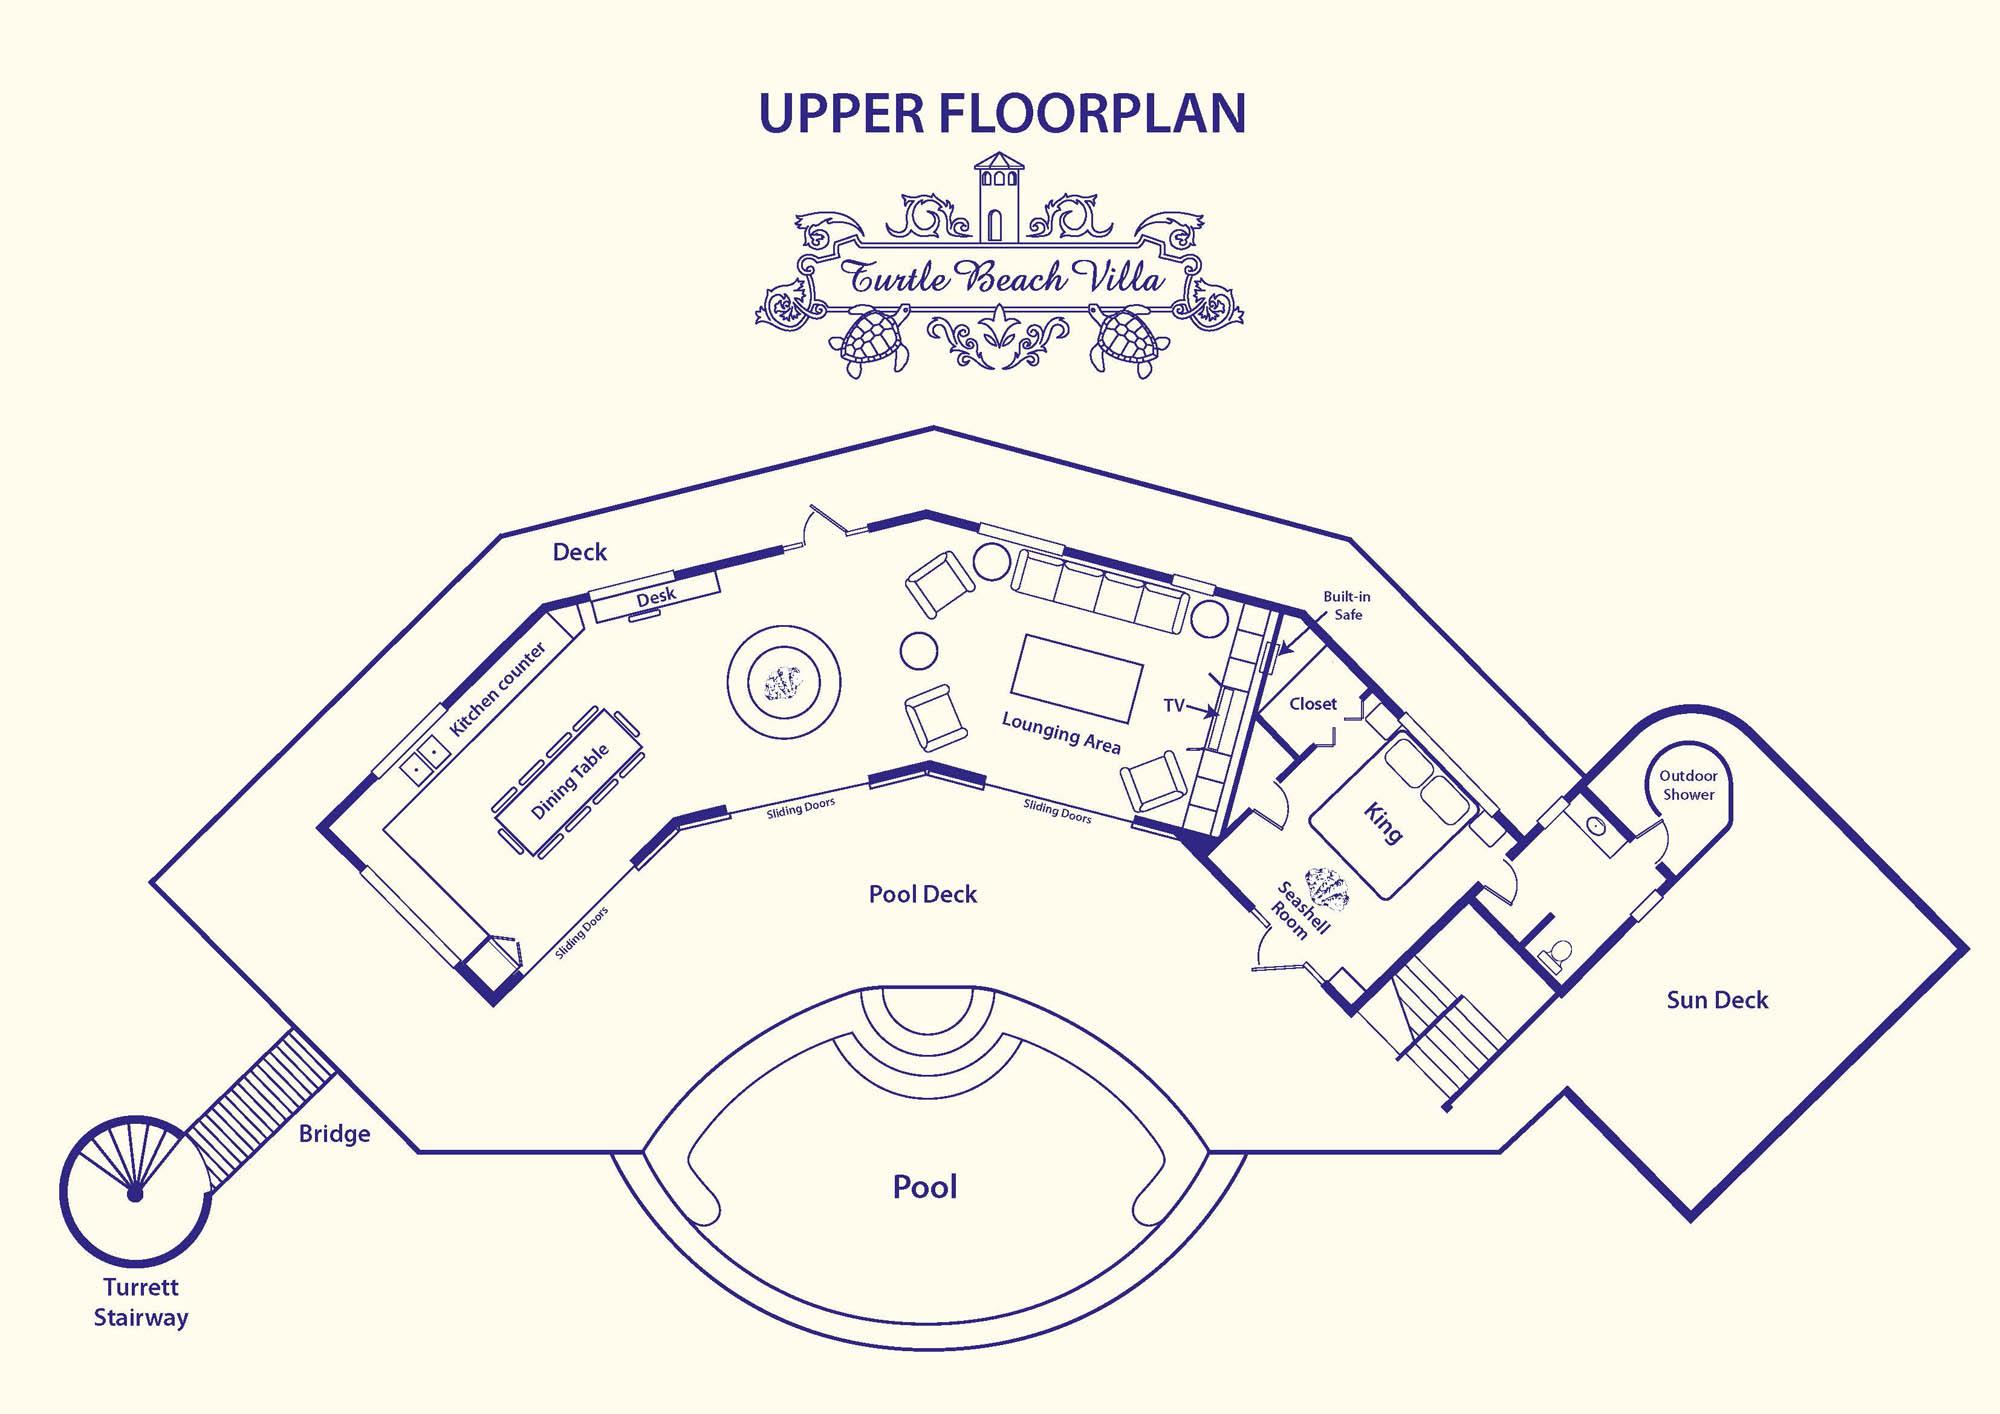 The upper level floorplan of Turtle Beach Villa, Grace Bay Beach, Providenciales (Provo), Turks and Caicos Islands.